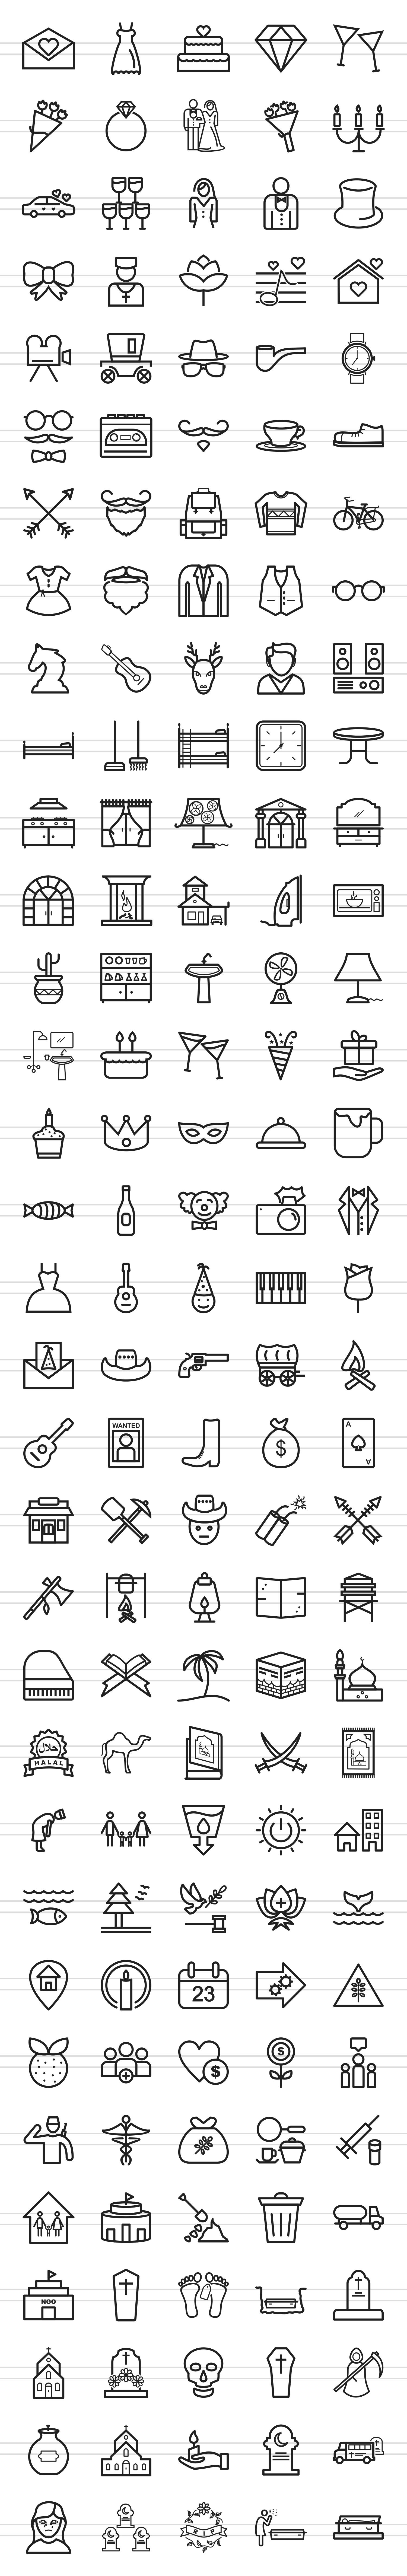 166 Lifestyle Line Icons example image 2